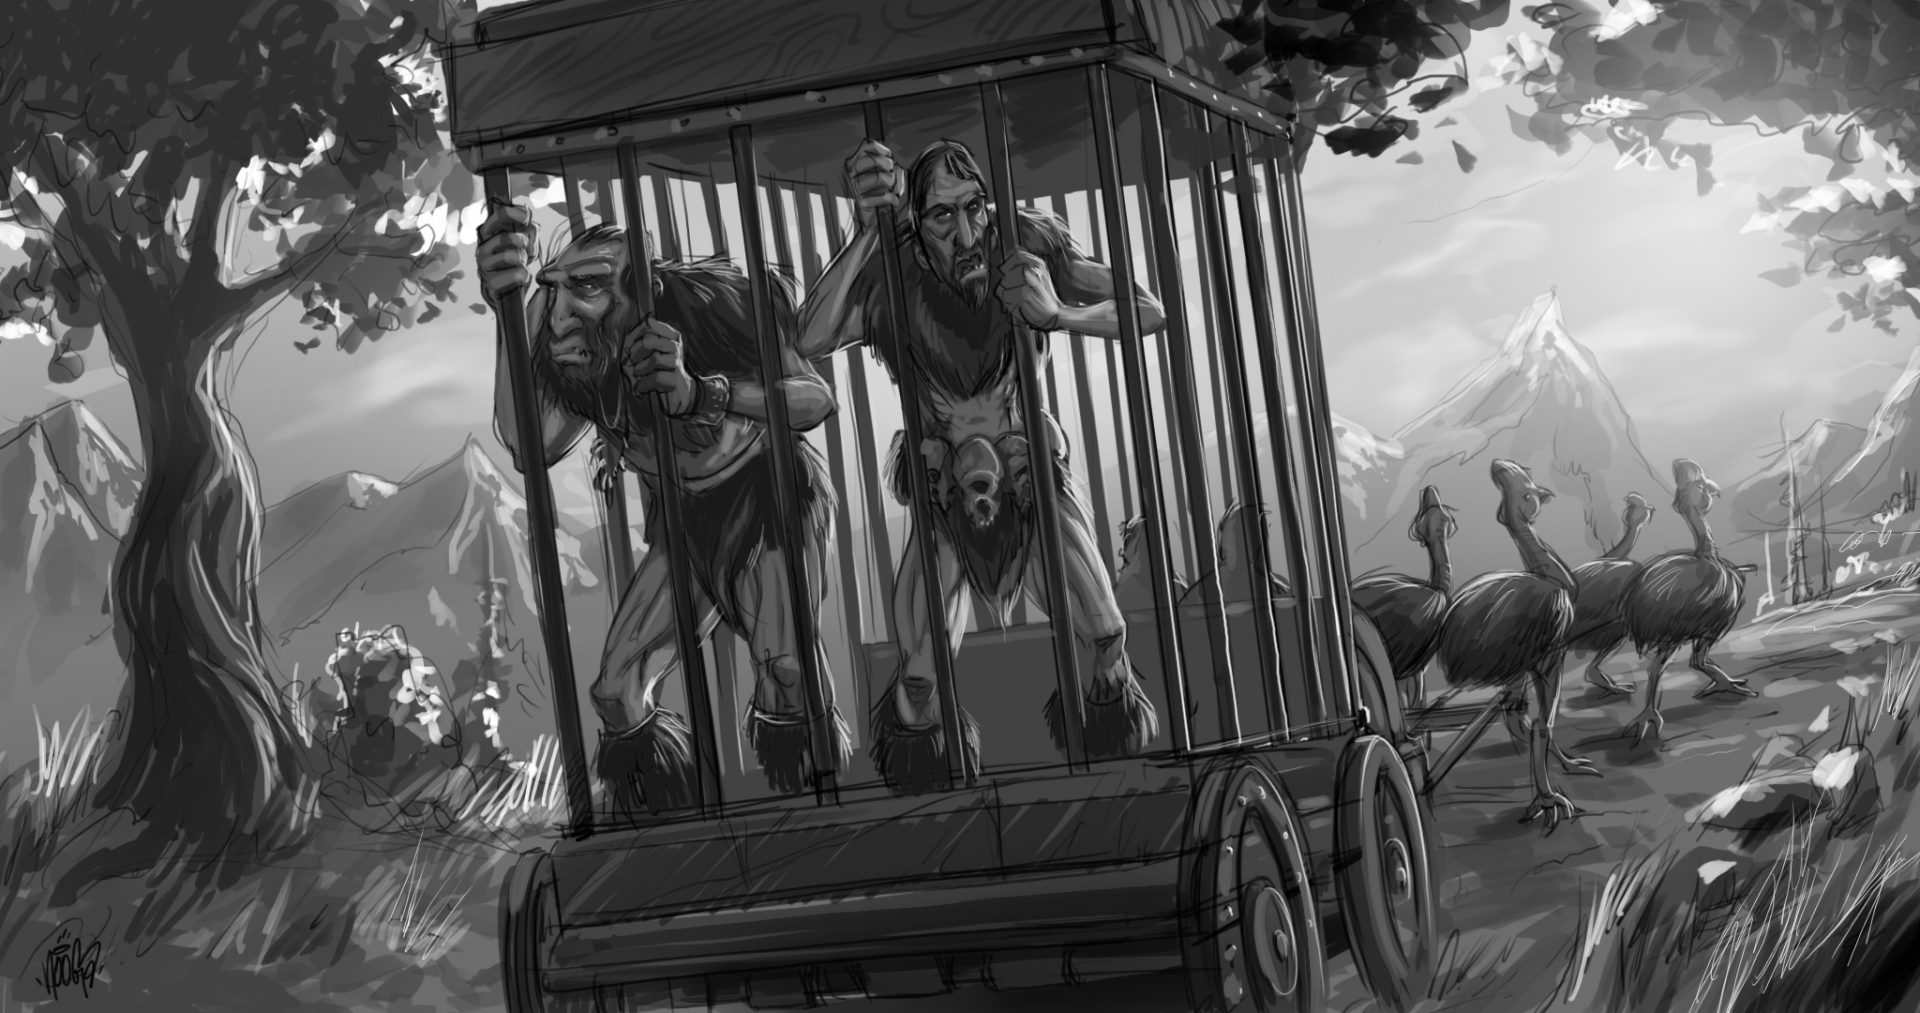 the-gyre-caged-ogres-copie-copie